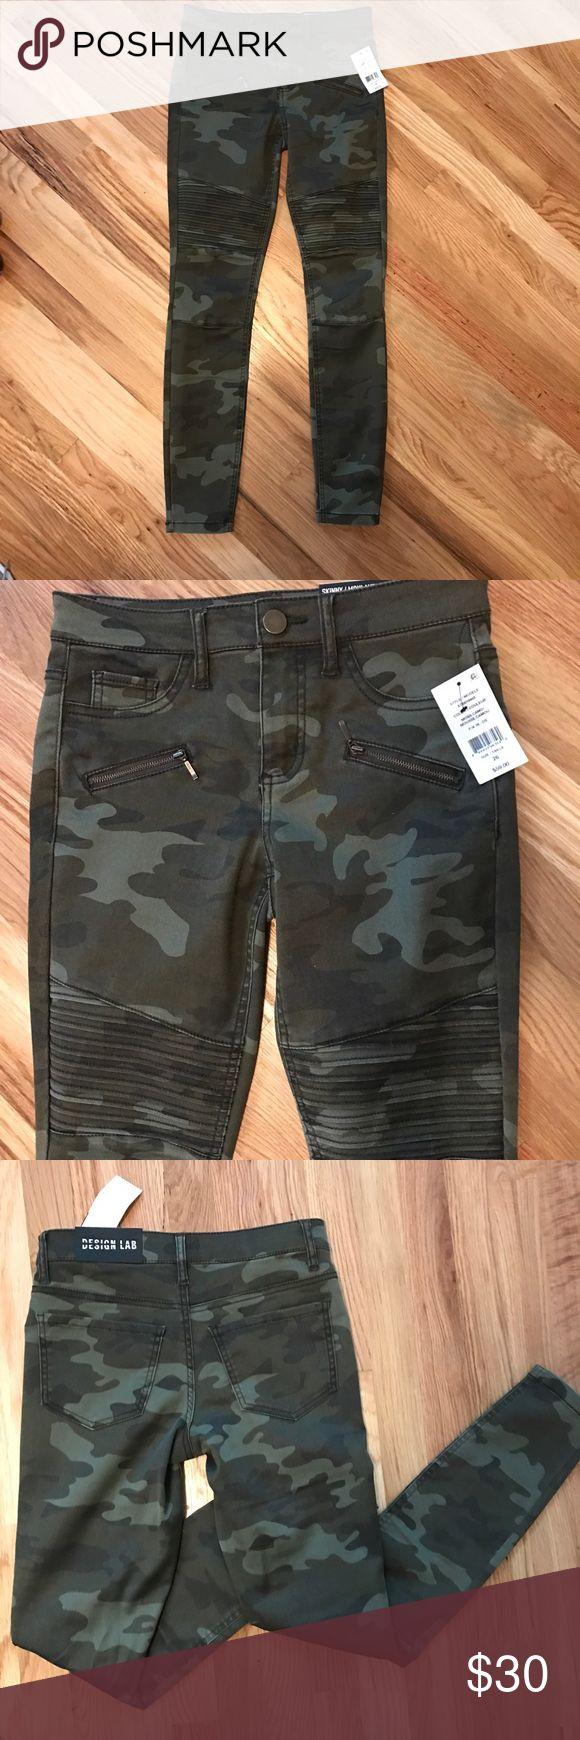 NWT, Camo Skinny Pants Lord & Taylor (Design Lab) camp pants, with cute details Lord & Taylor Pants Skinny